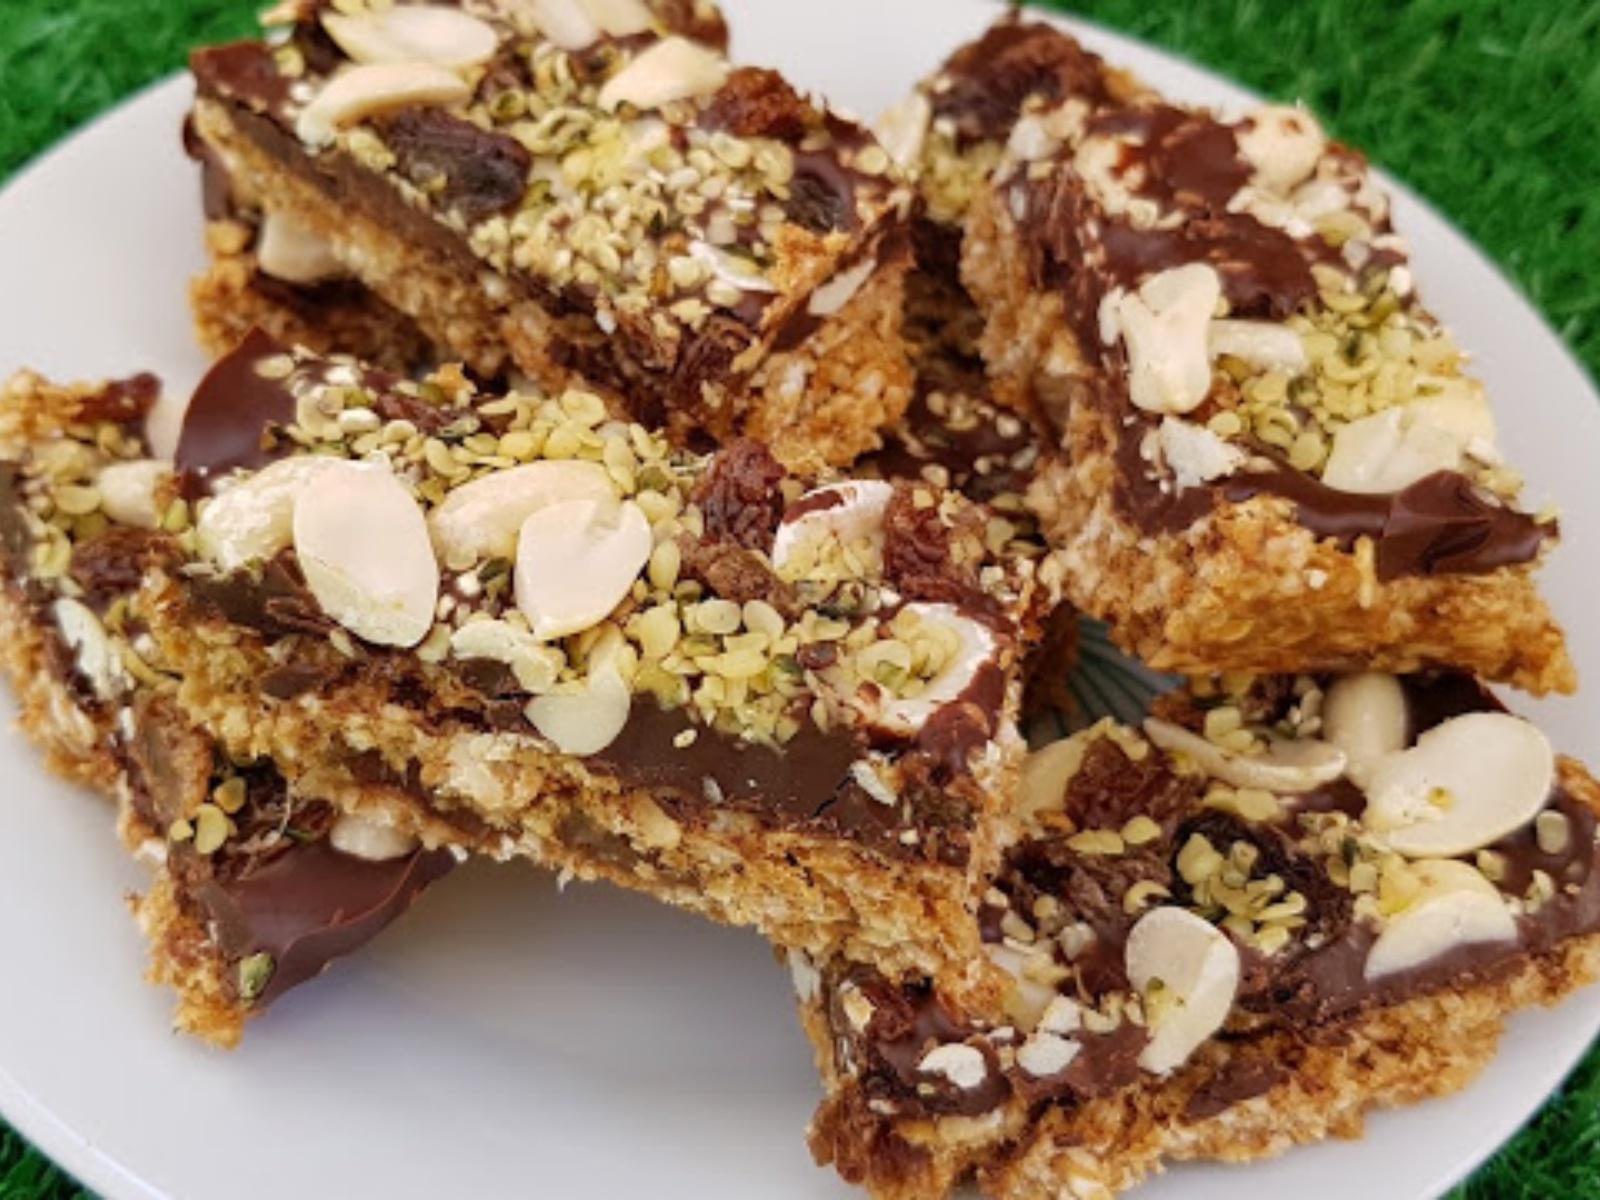 Vegan Chocolate Oatmeal and Nut Energy Bars